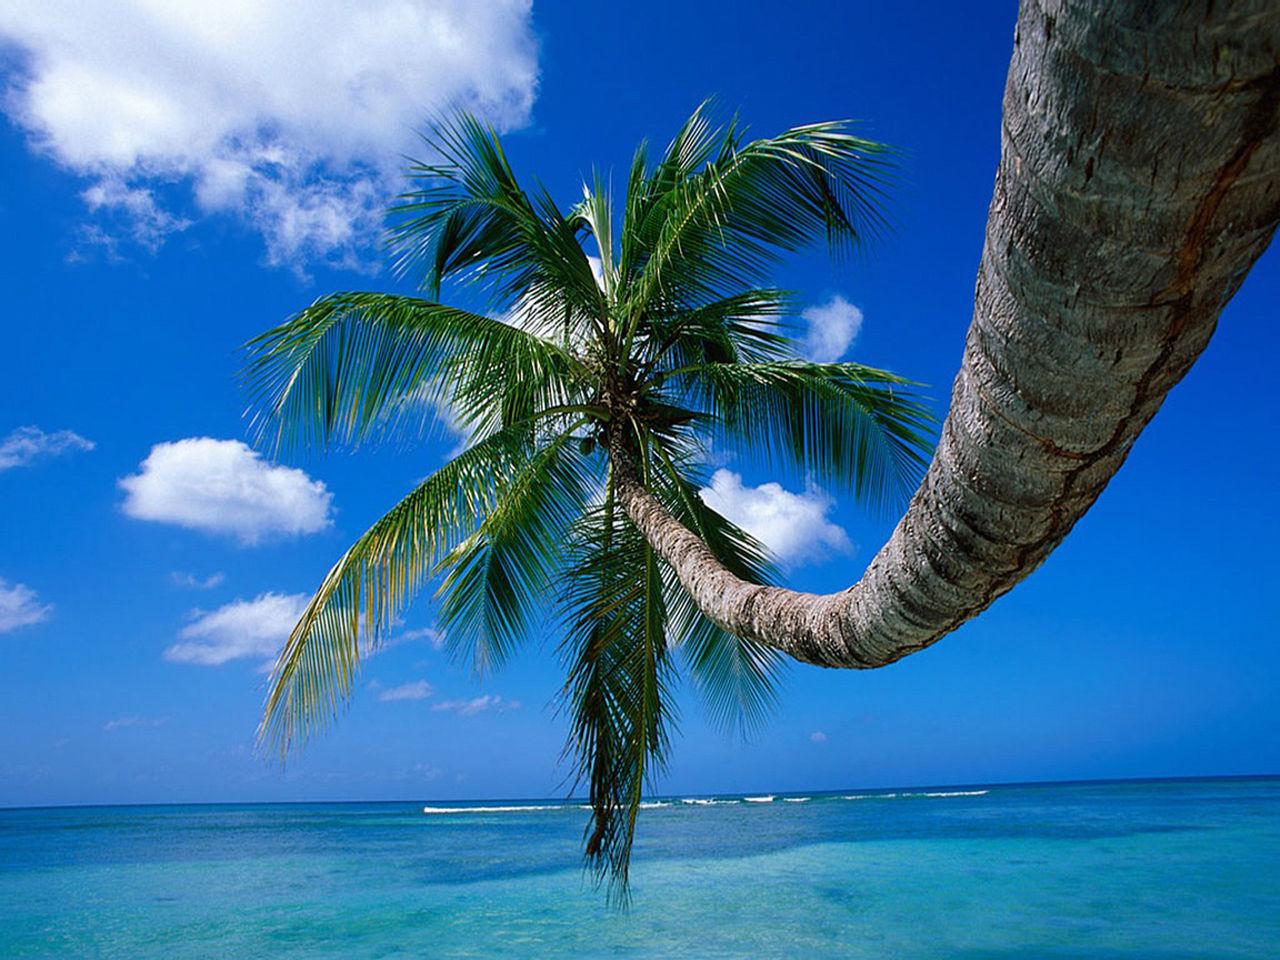 Guillaume Belche Wallapaper - palmiers